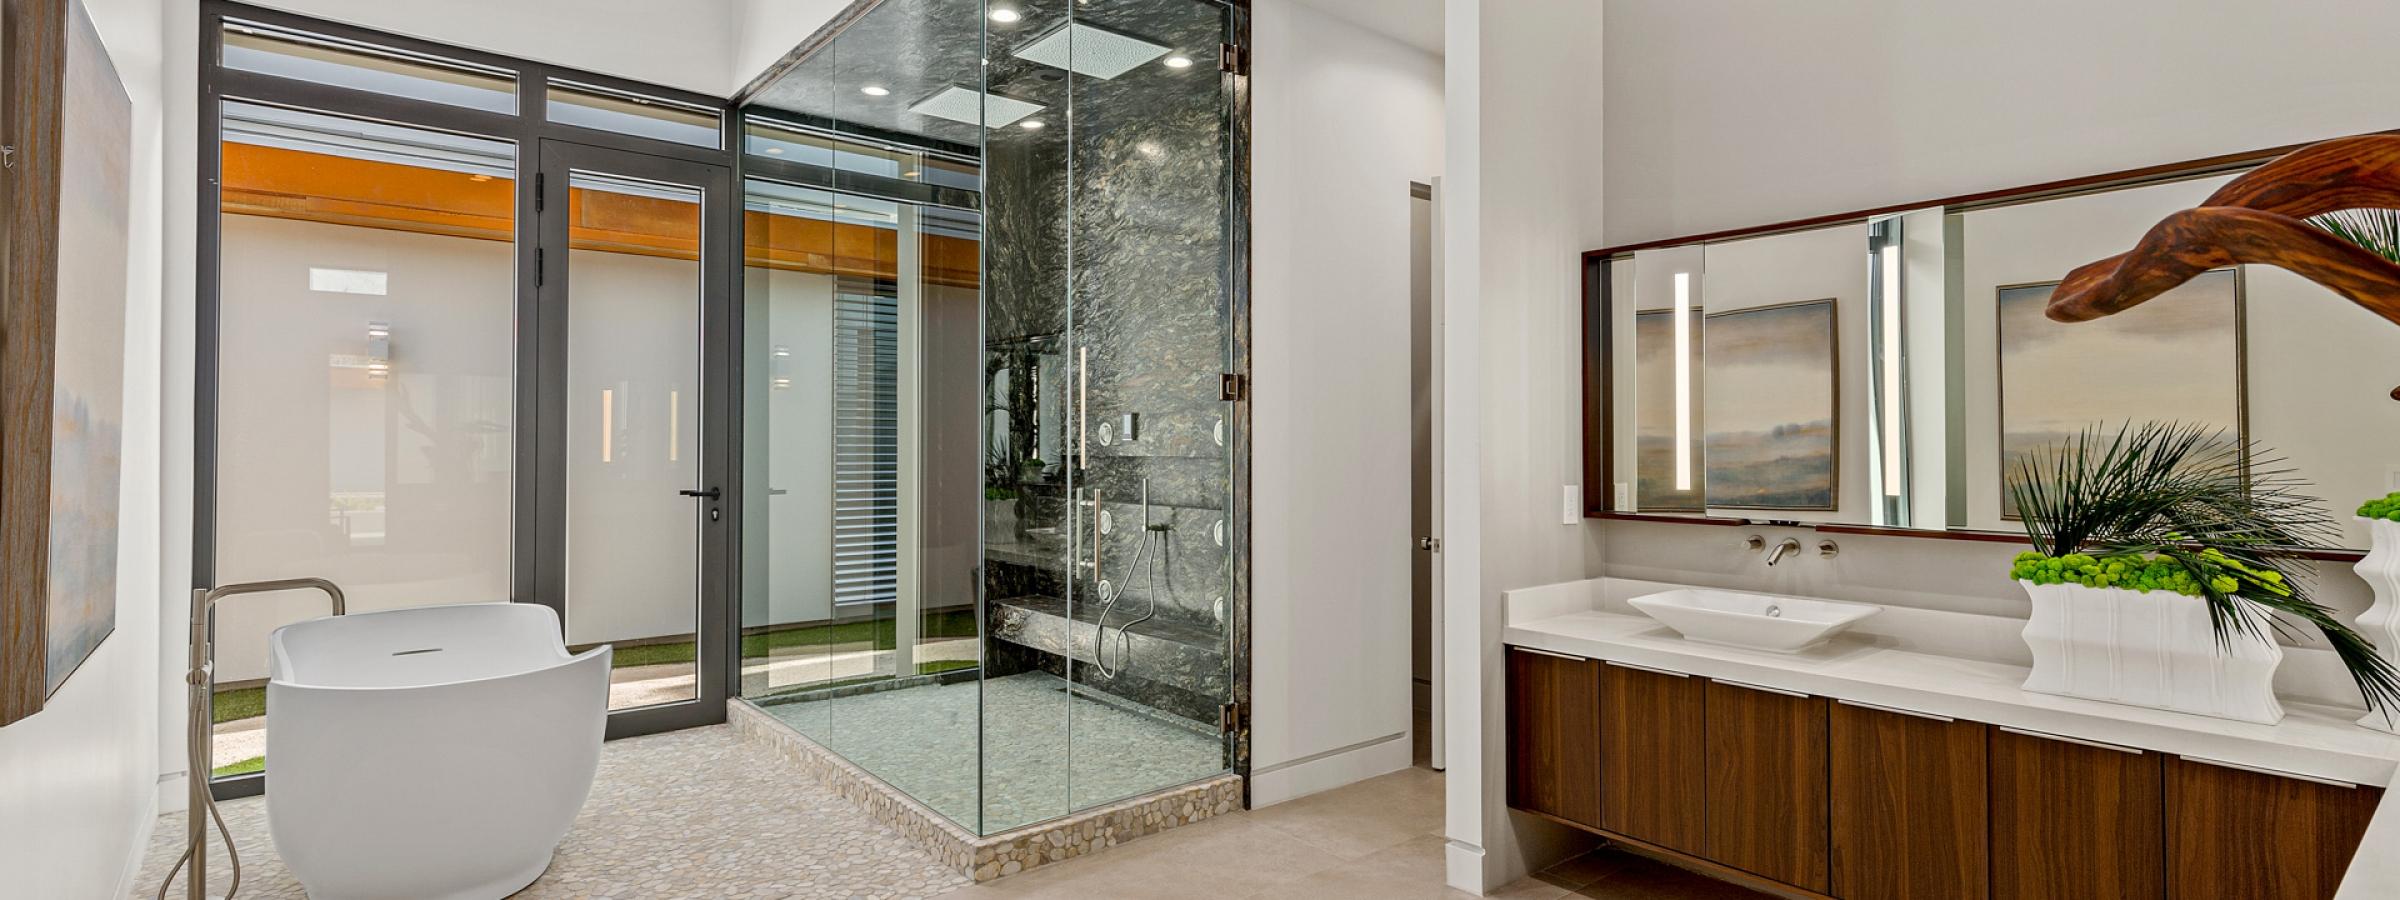 Infinity Drain's Fall 2021 Bathroom Trends Report